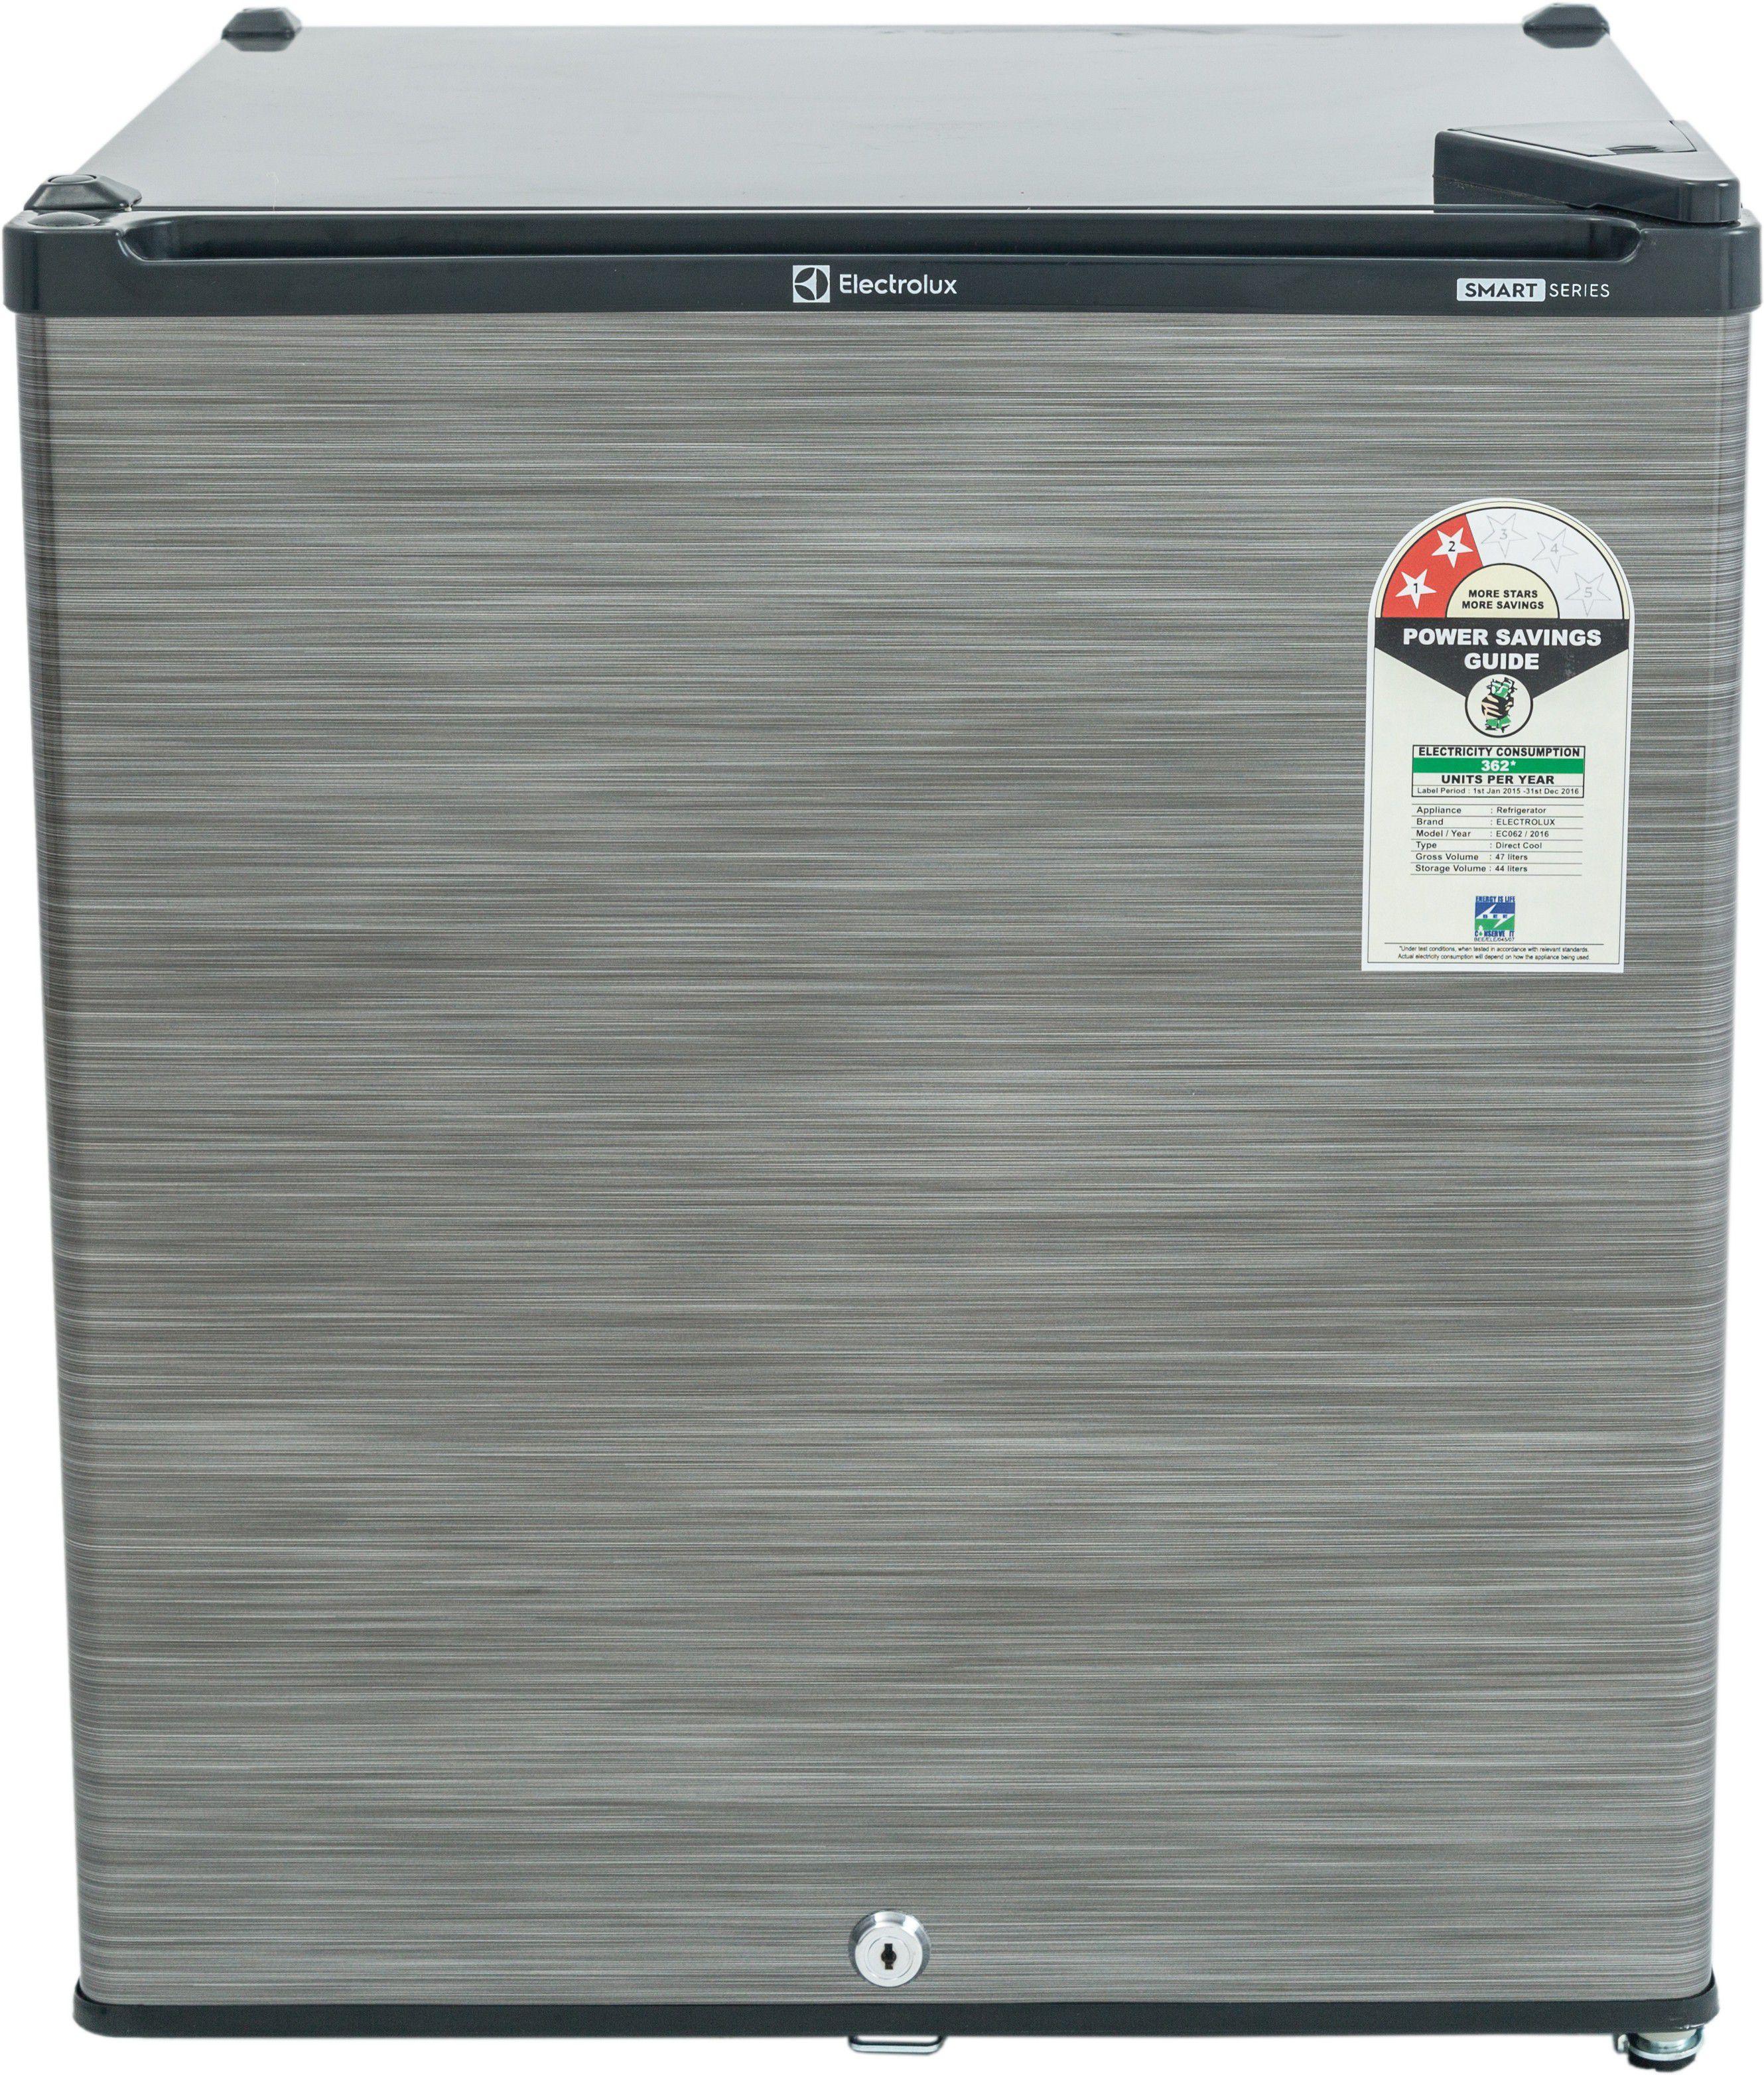 Electrolux 47 Ltr EC060PSH/EC062PBH Direct Cool Refrigerator Silver / Black Hairline